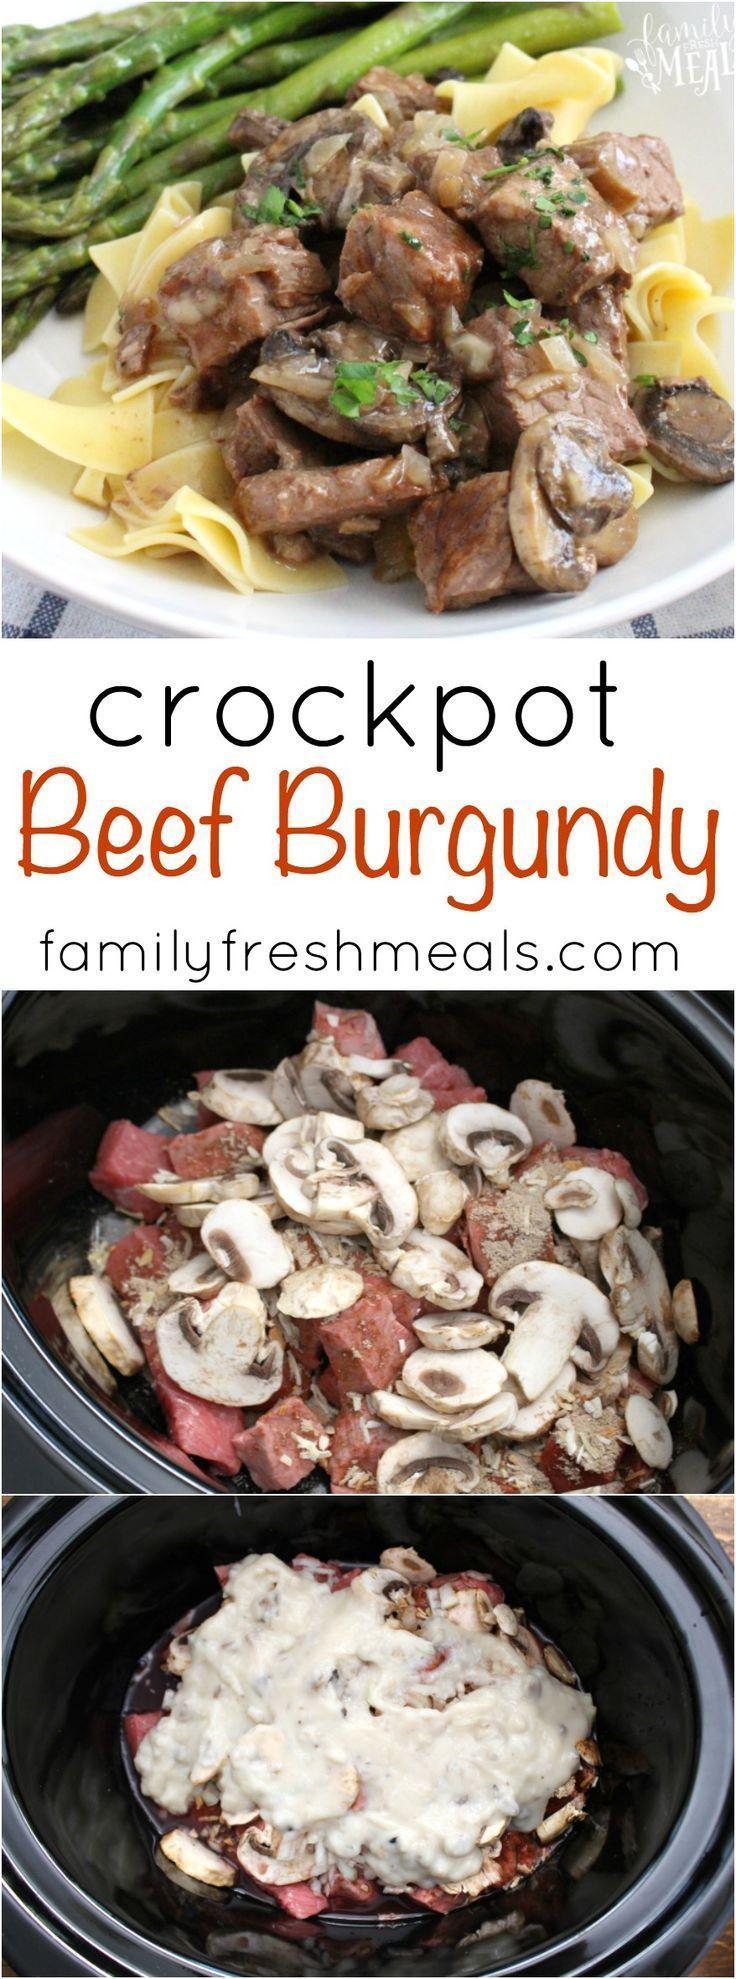 Easy Crockpot Beef Burgundy - FamilyFreshMeals.com - Love this recipe